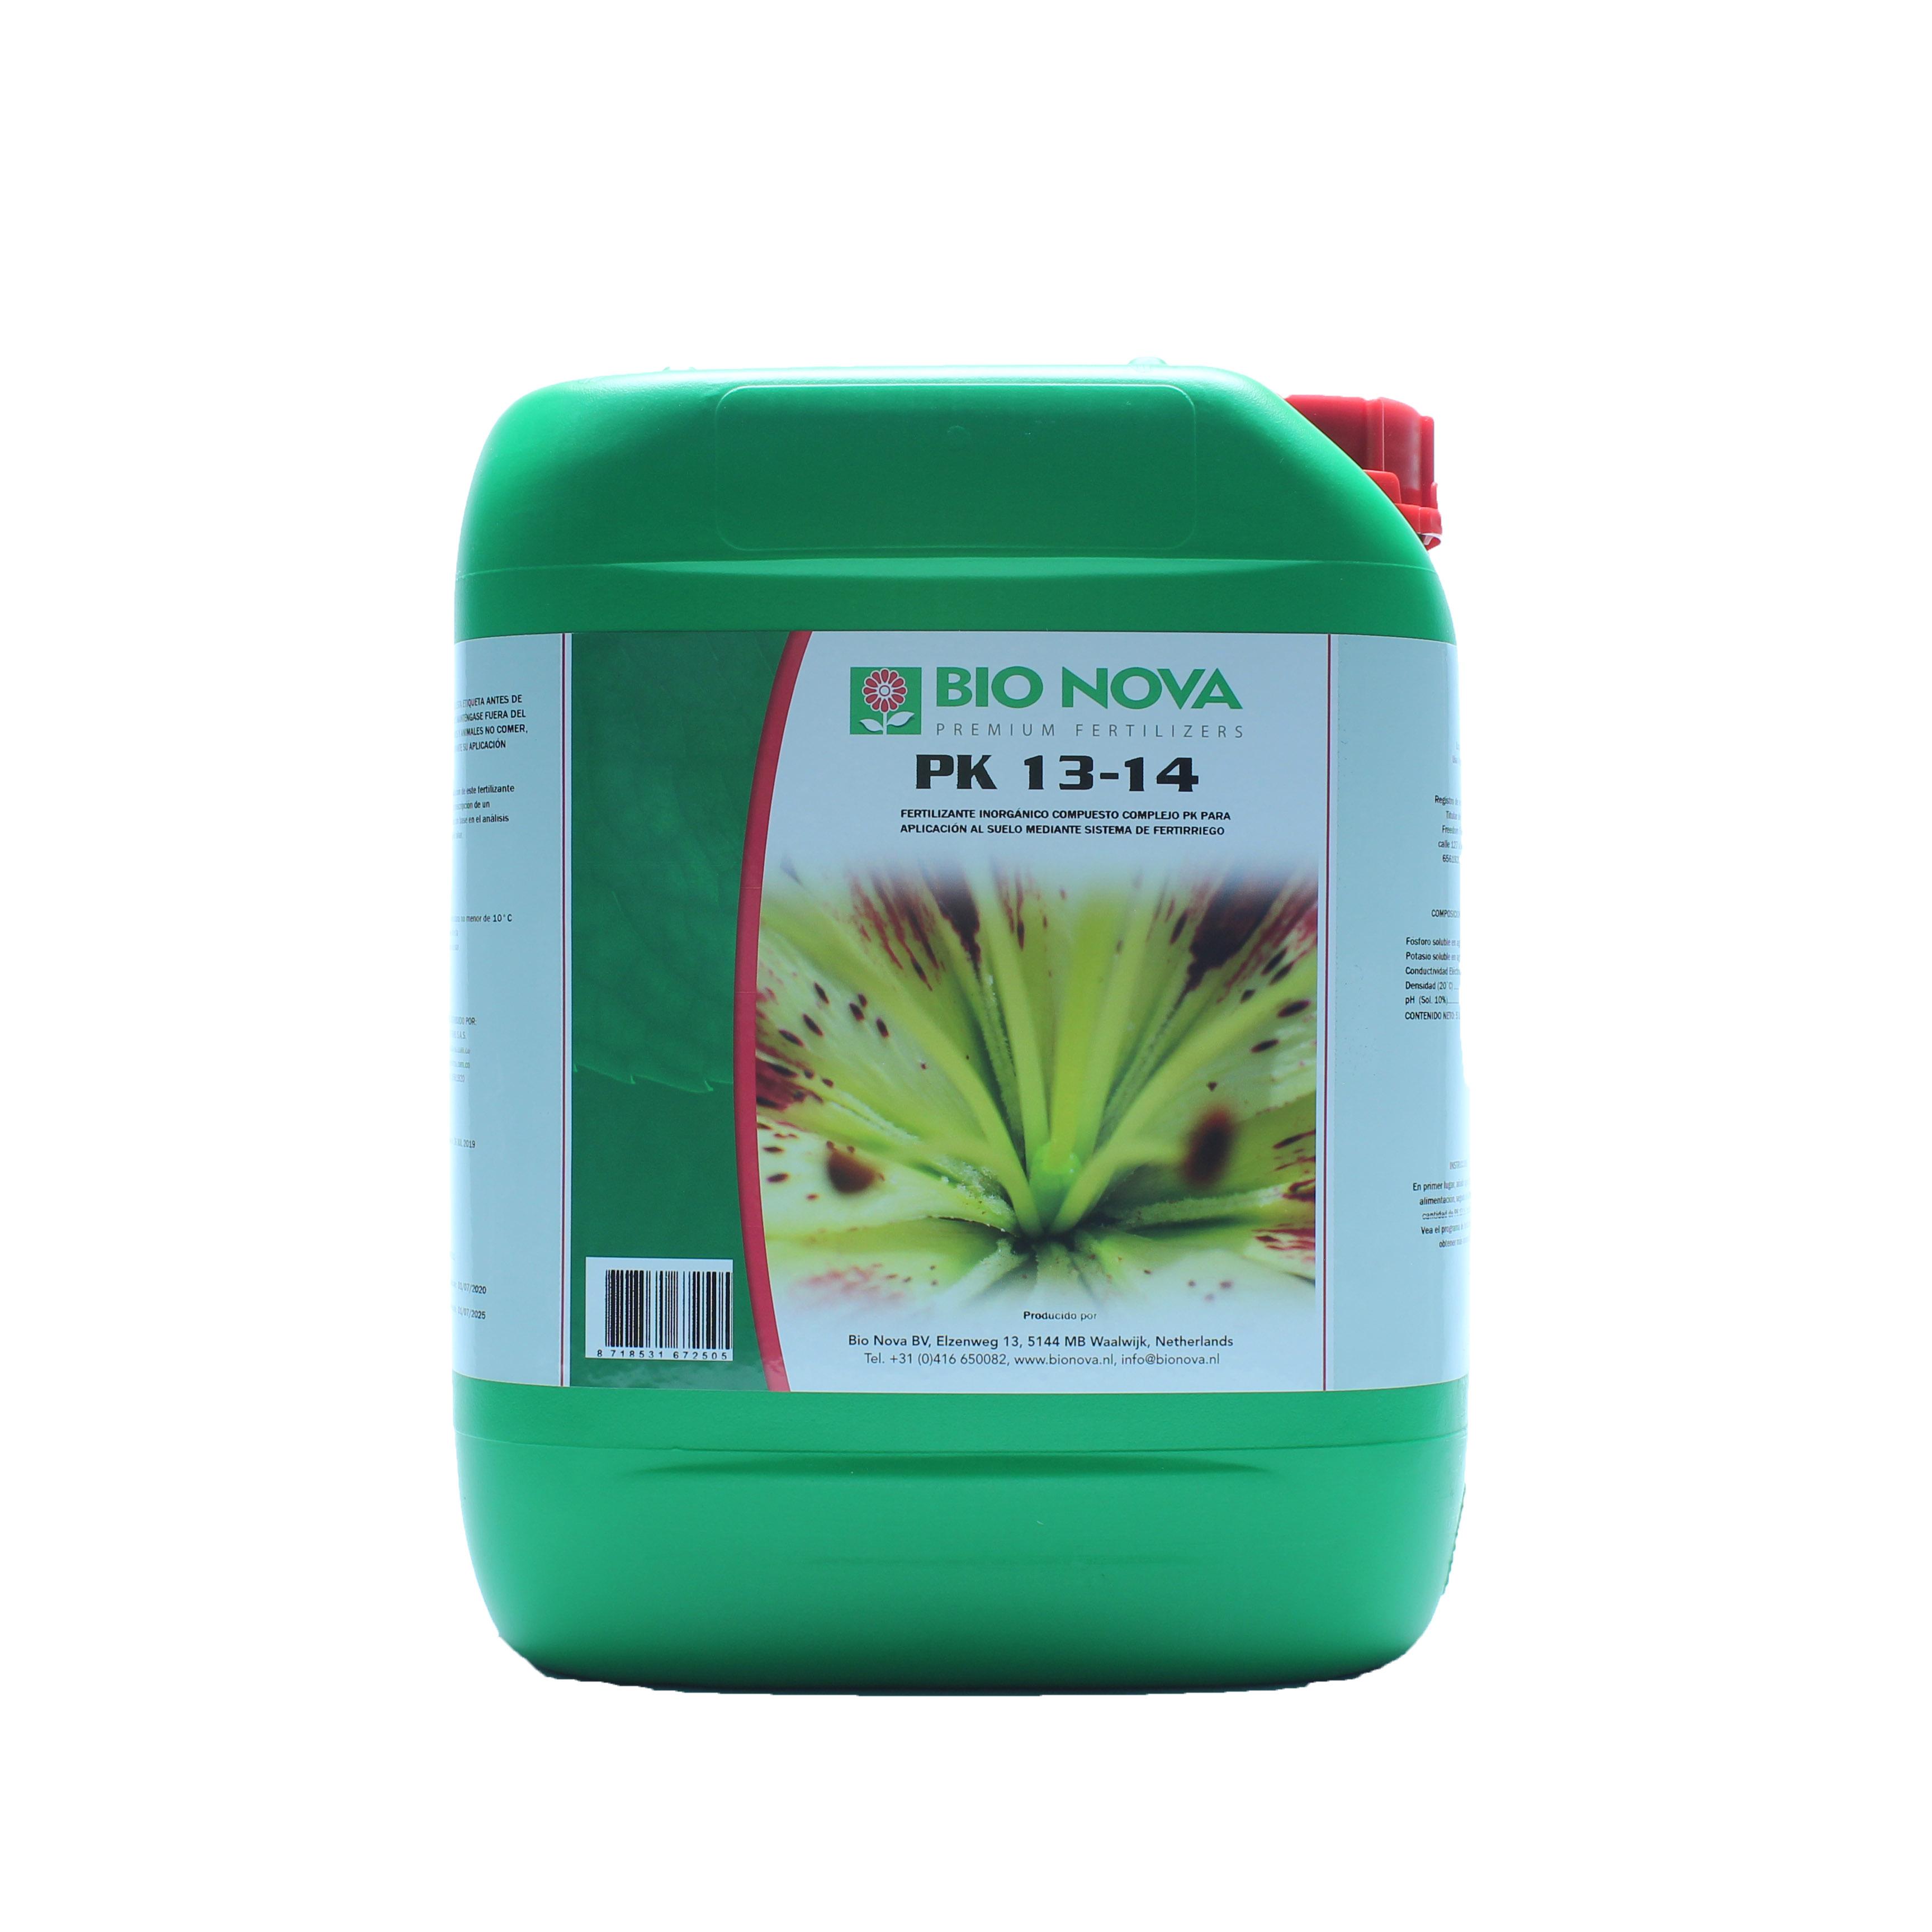 Fertilizante bio nova pk 13 14 tech industries